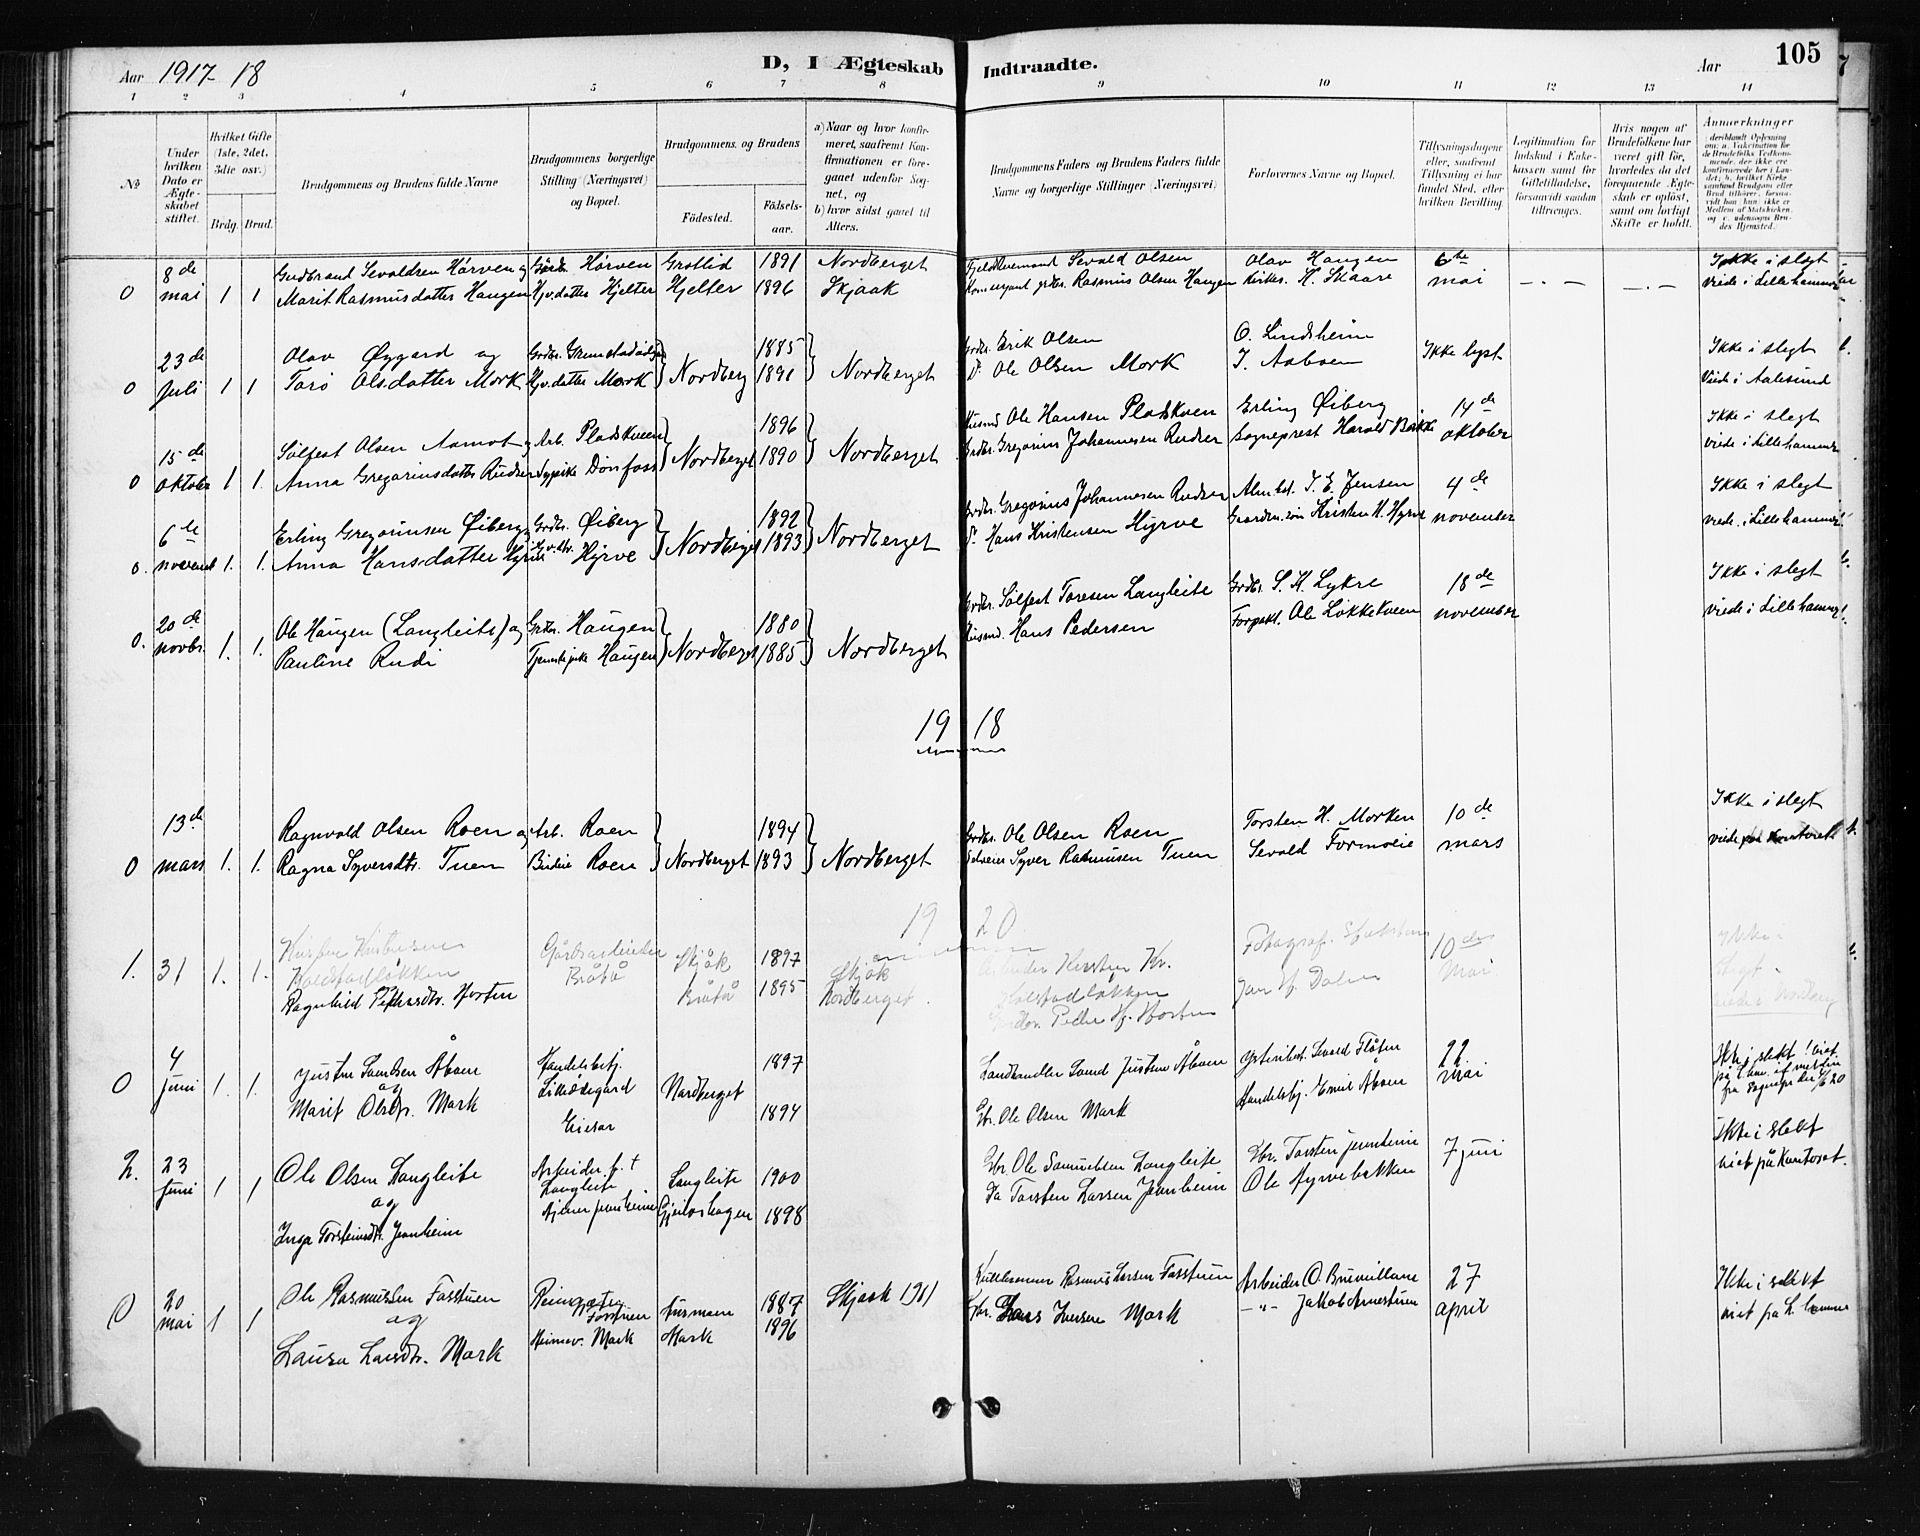 SAH, Skjåk prestekontor, Klokkerbok nr. 4, 1895-1921, s. 105